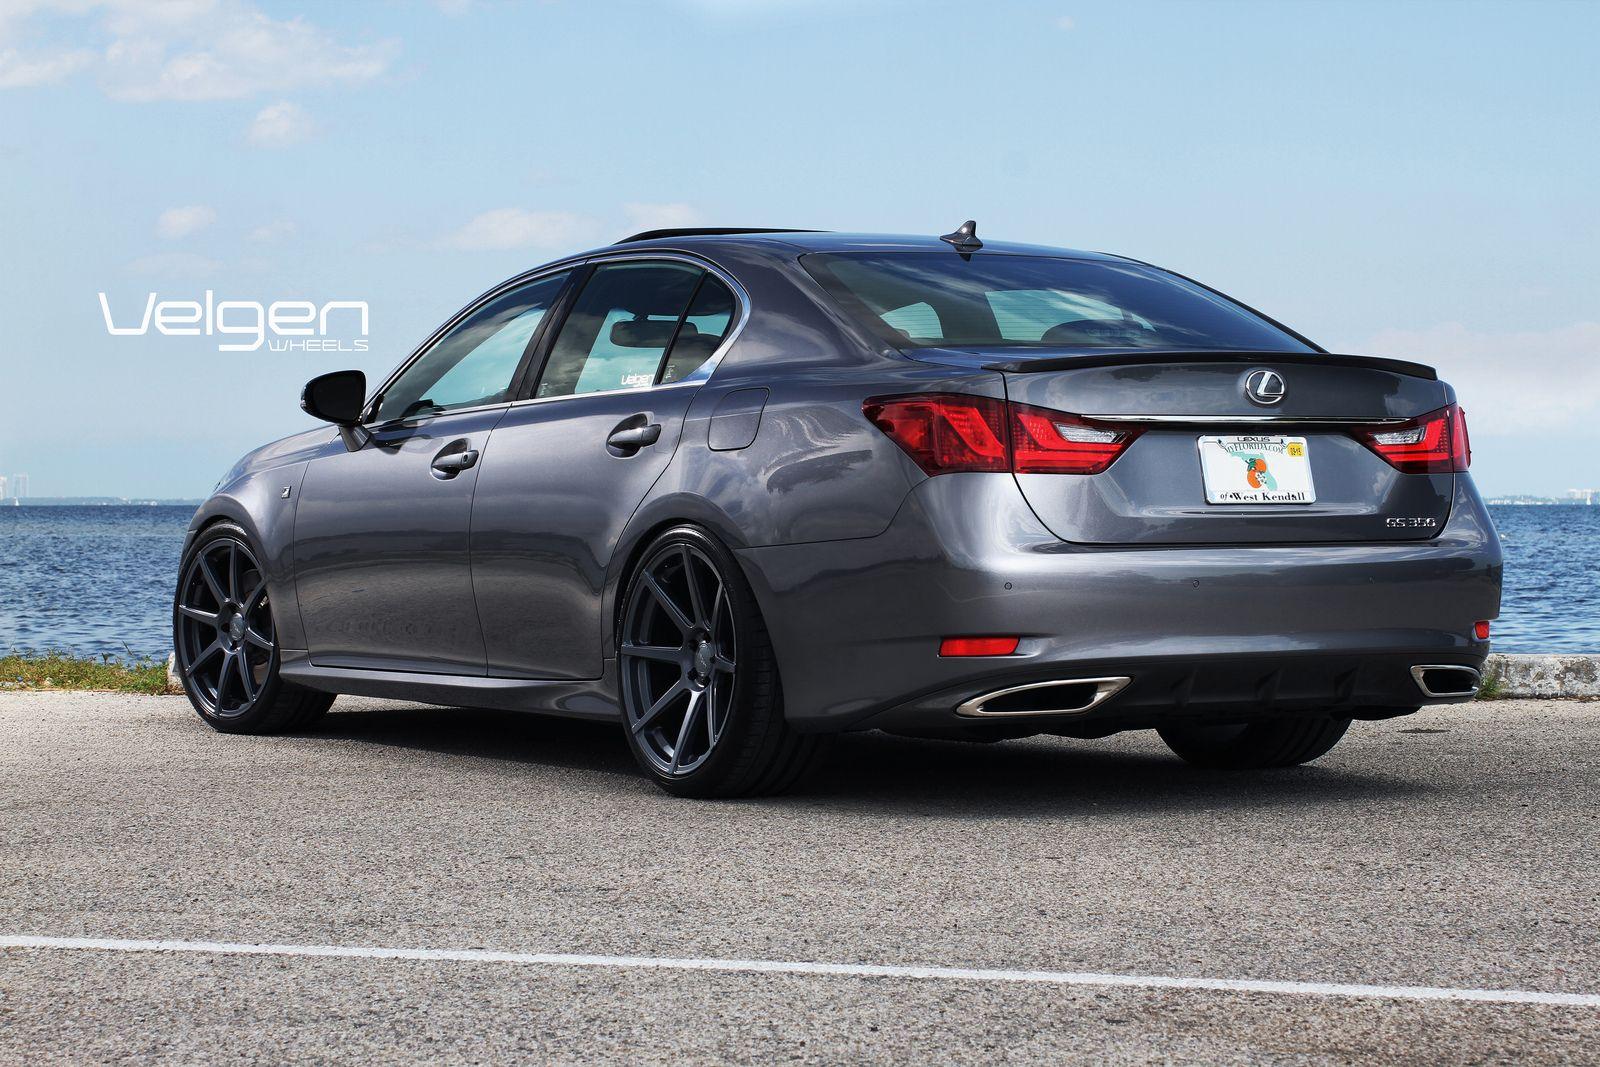 2014 lexus gs 350 f sport tire size